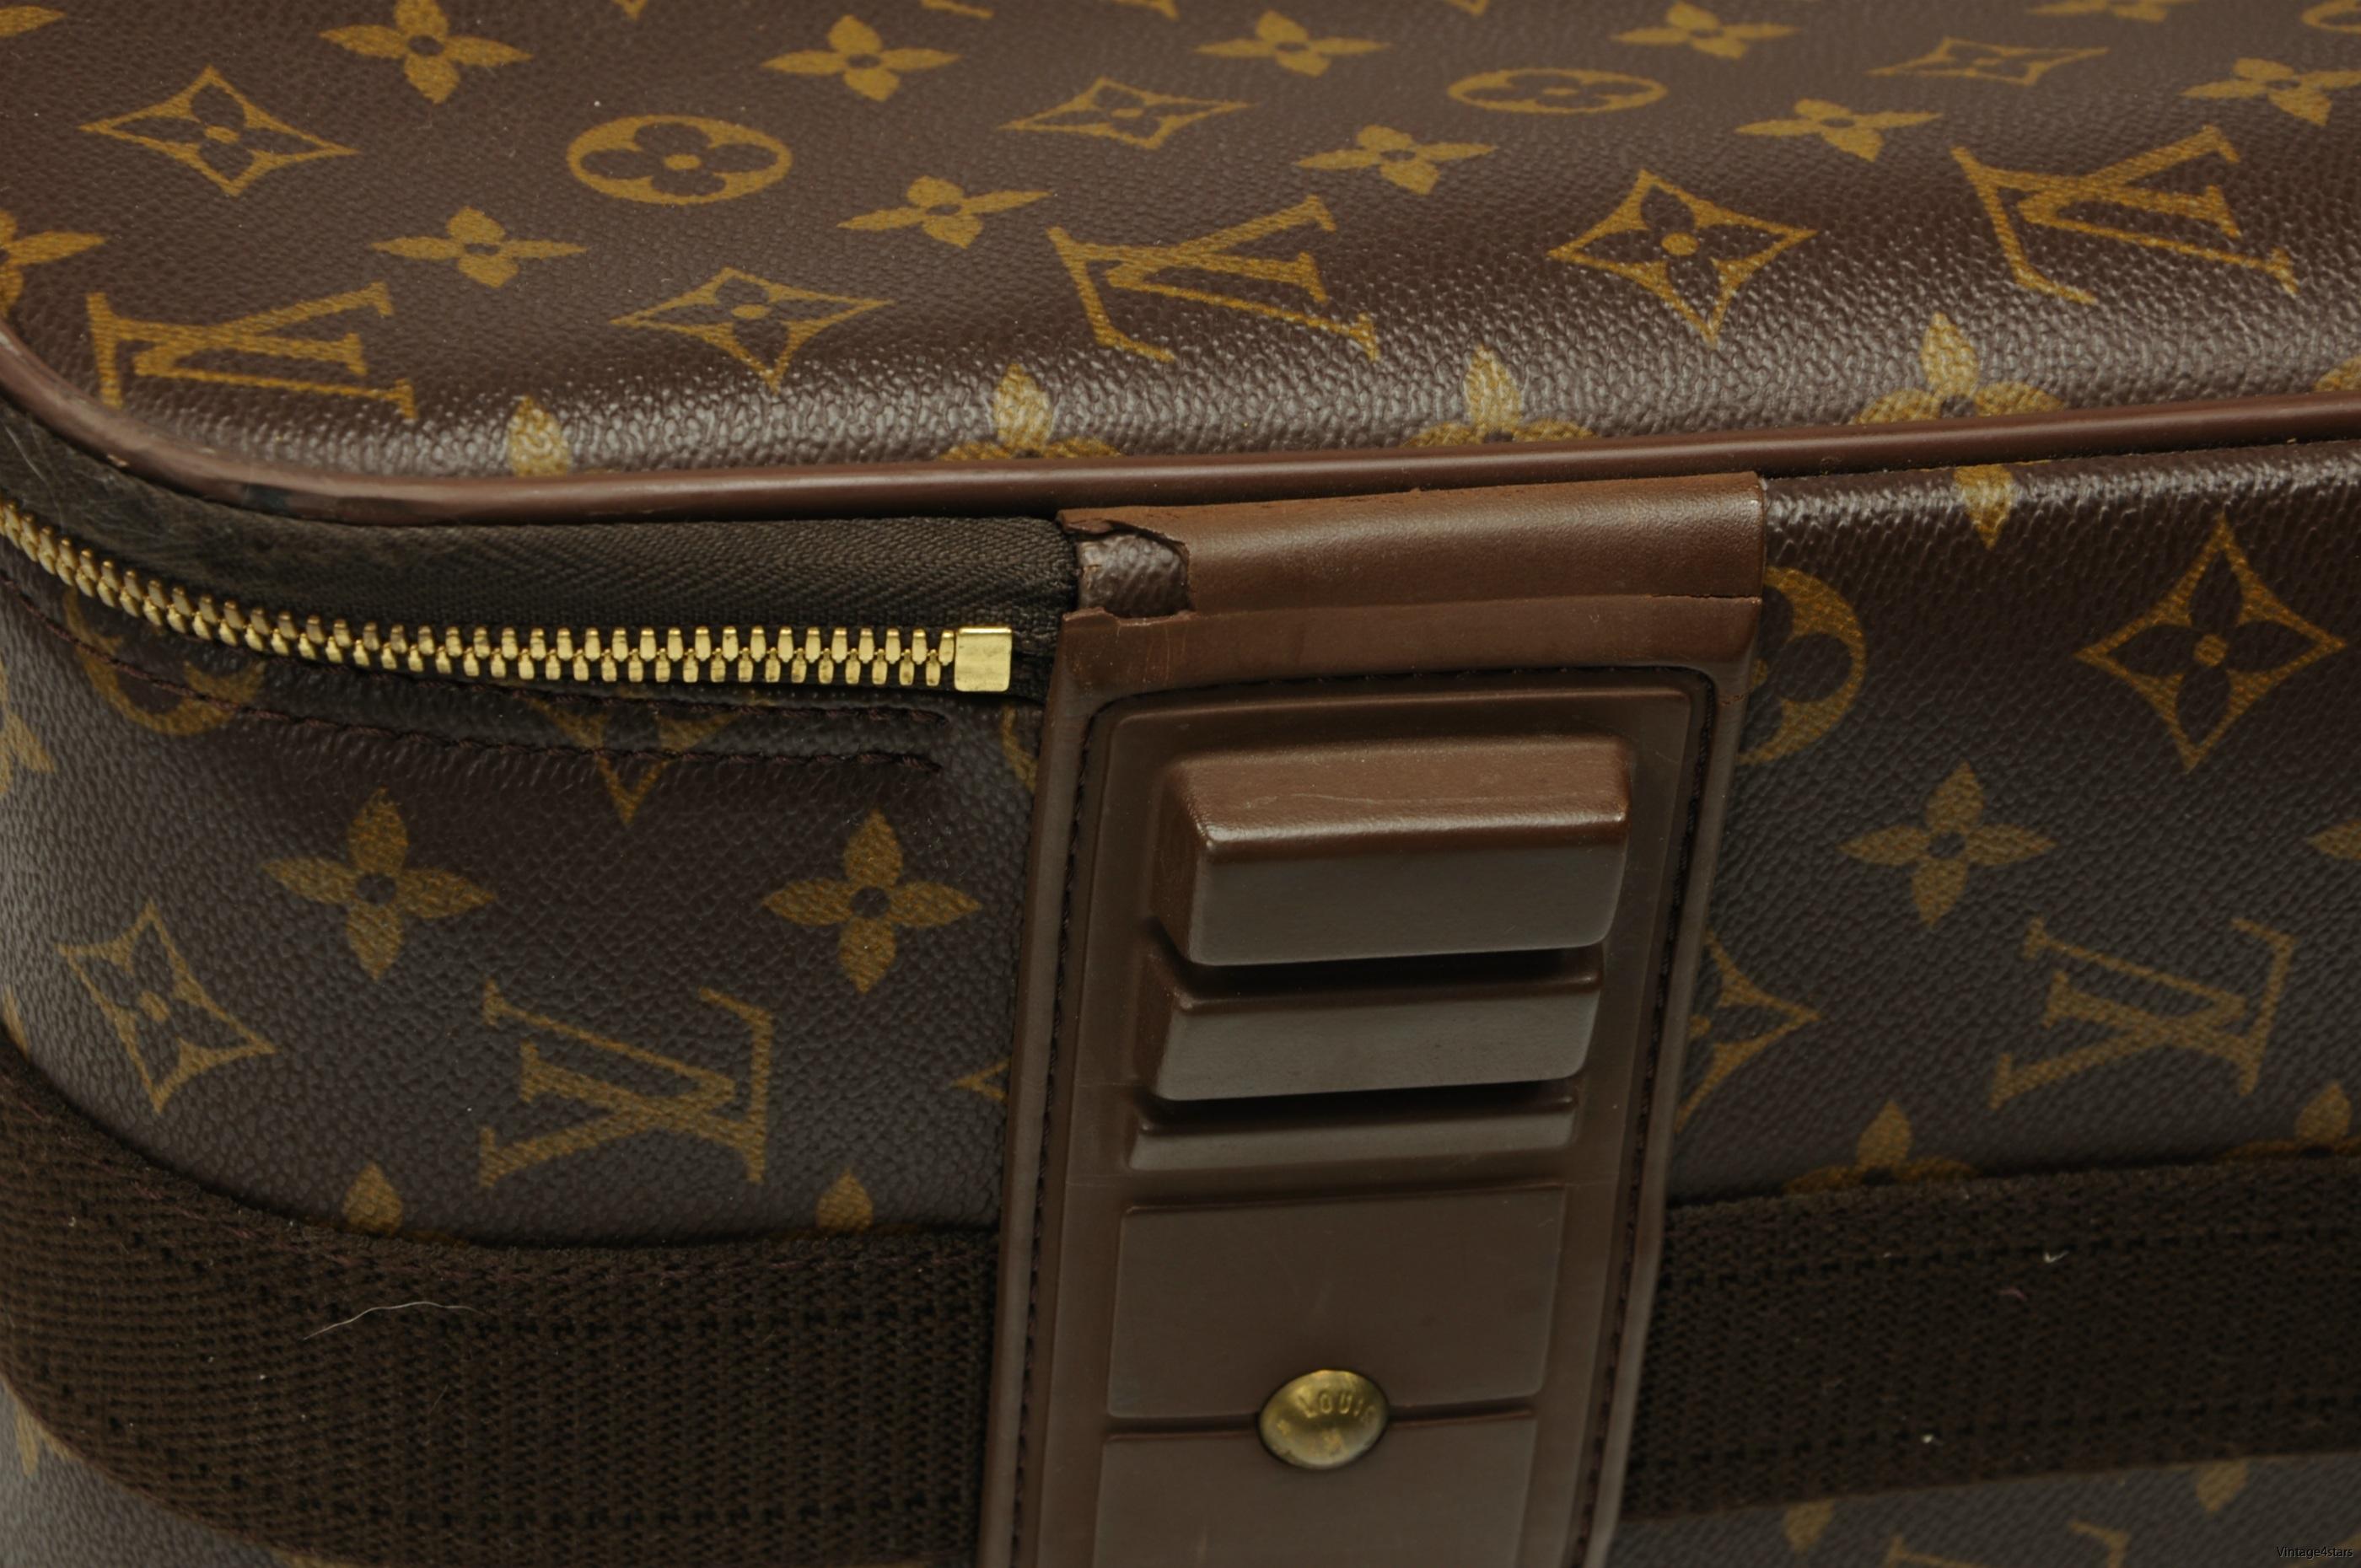 Louis Vuitton Pegase 55 Monogram 7